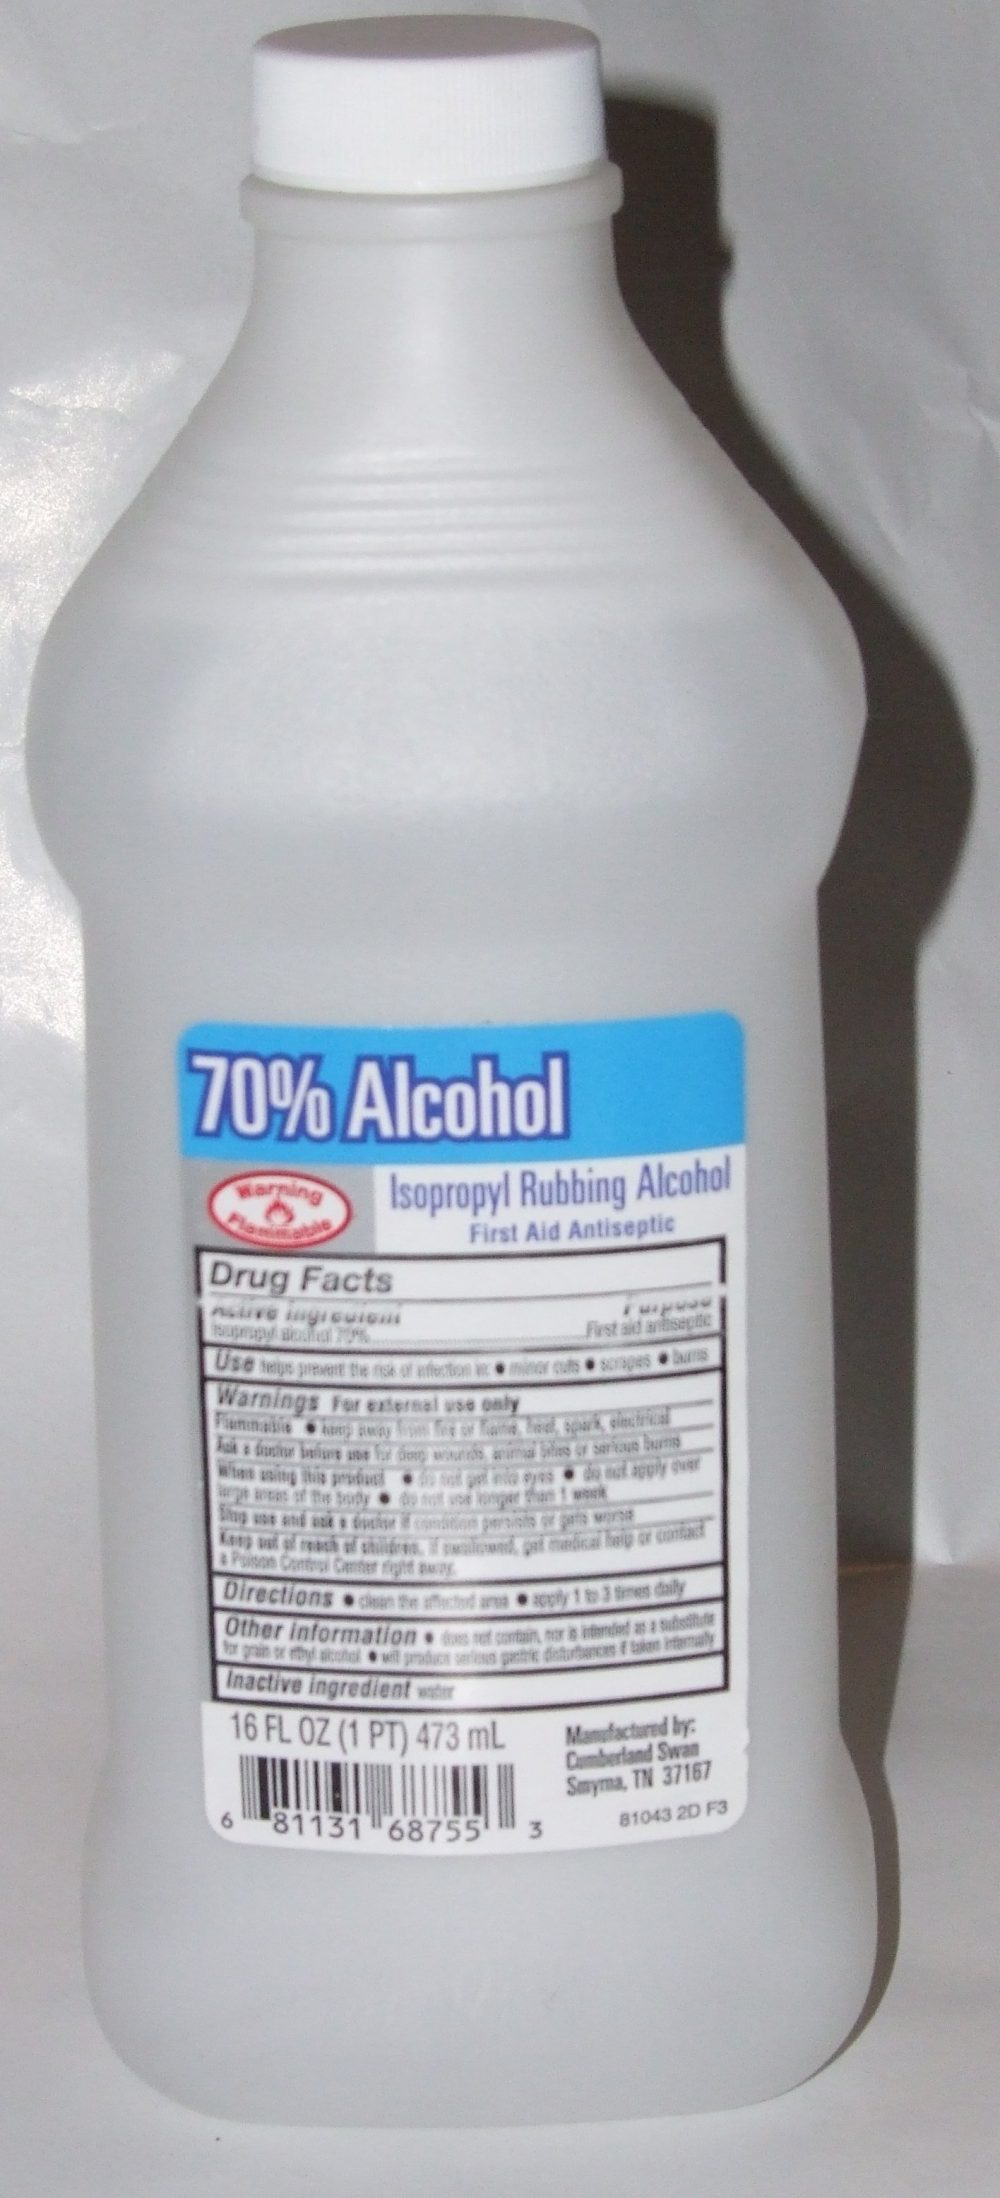 70% Alcohol